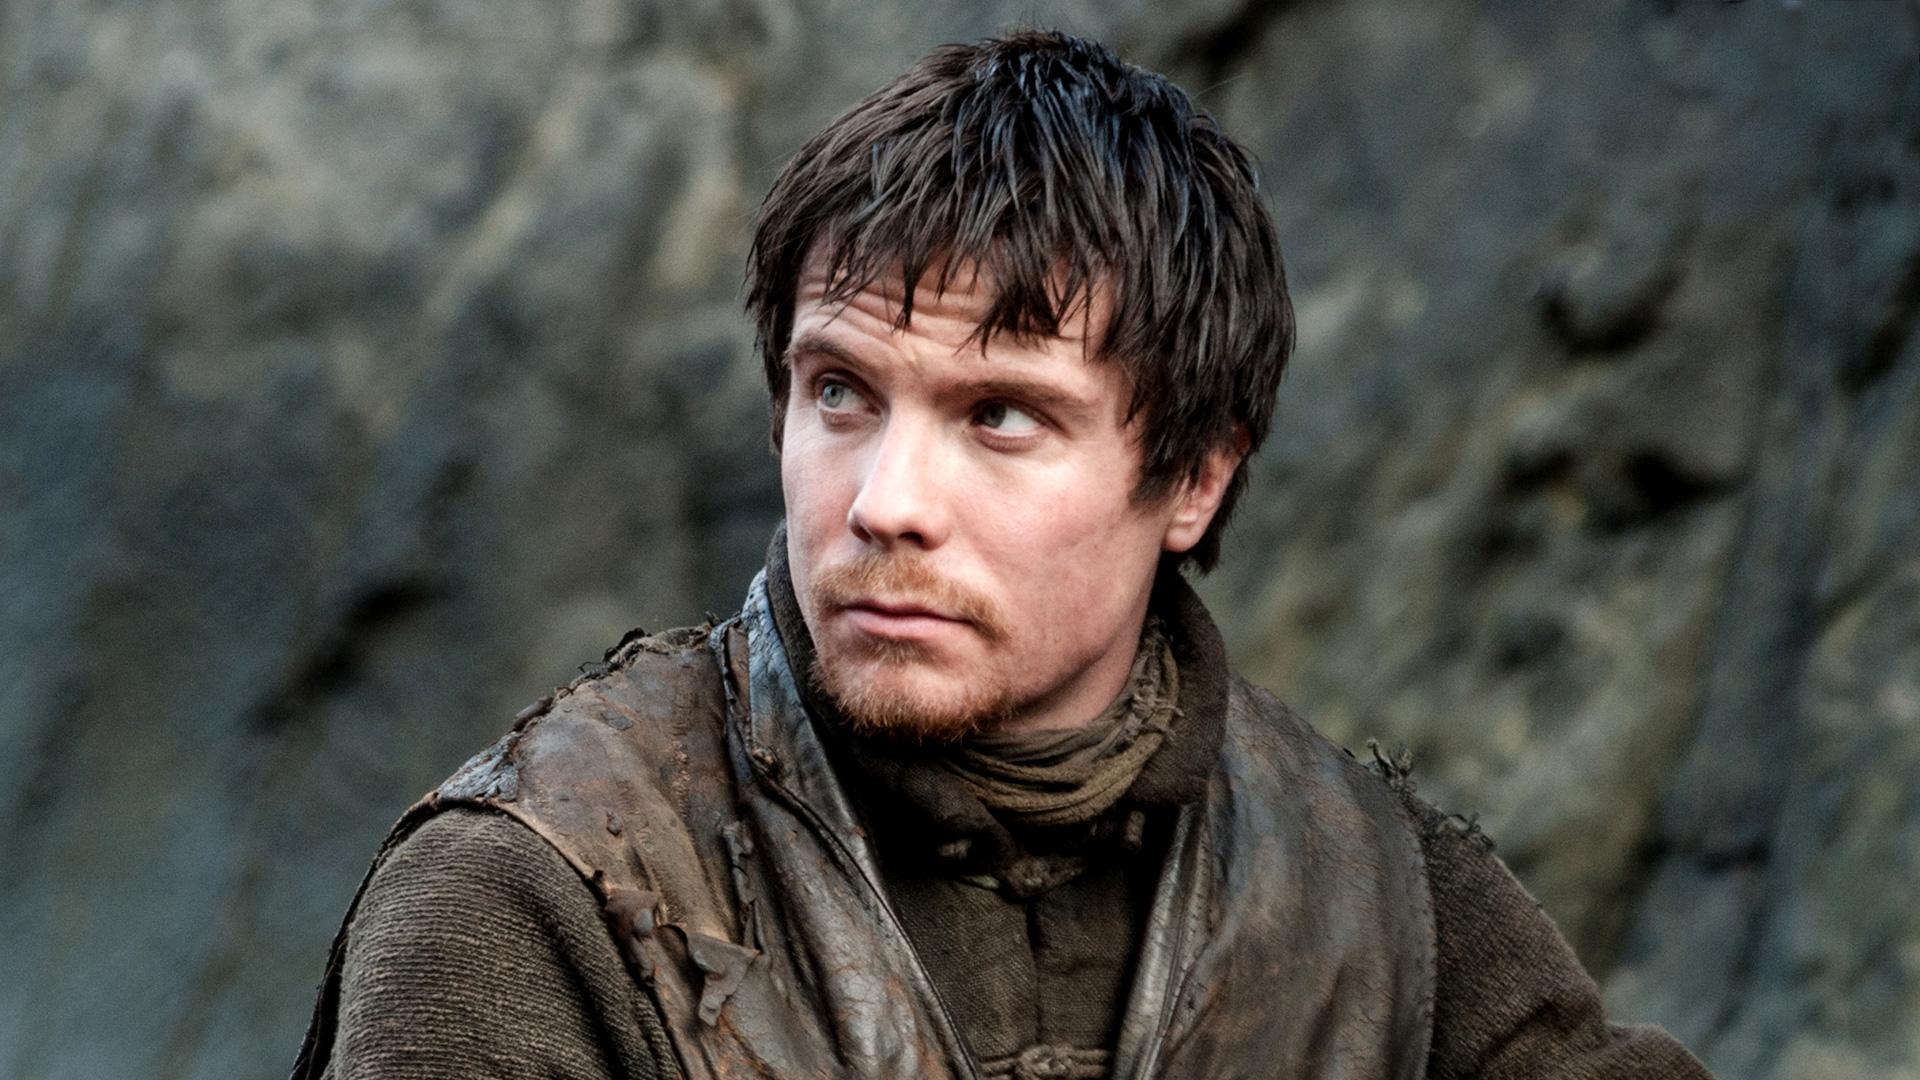 Gendry (Baratheon)